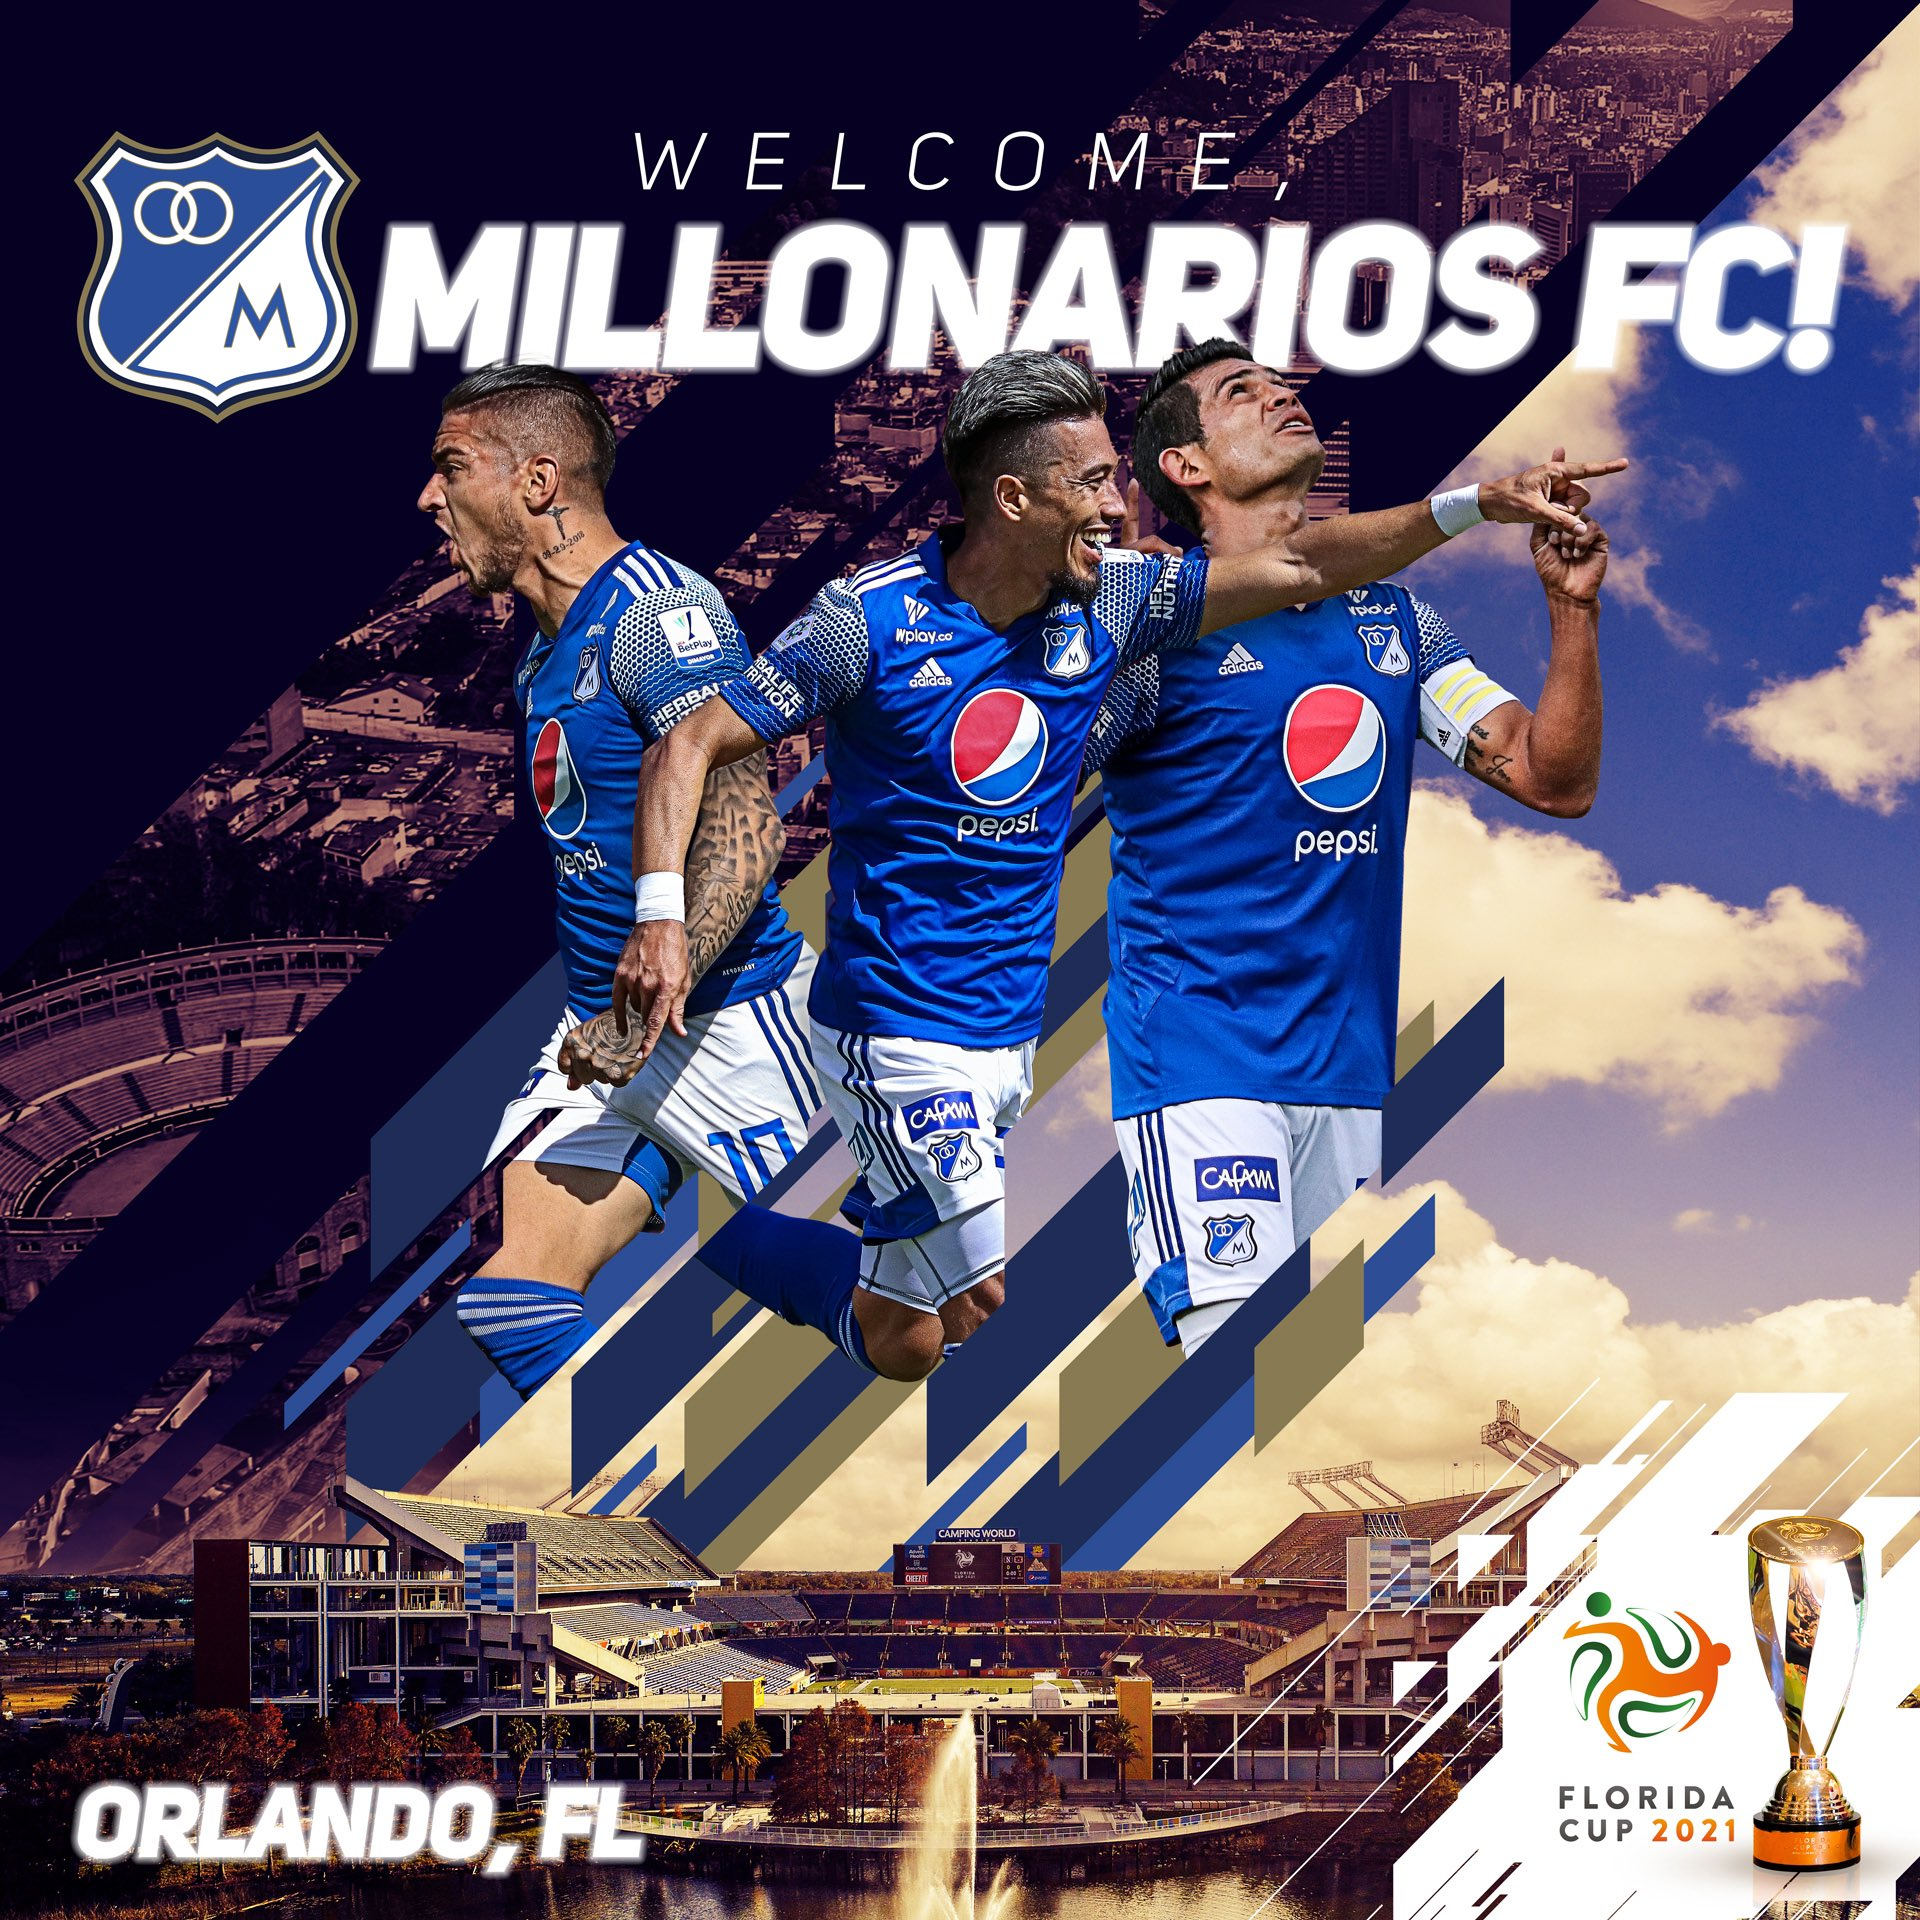 florida-cup-orlando-2021-03